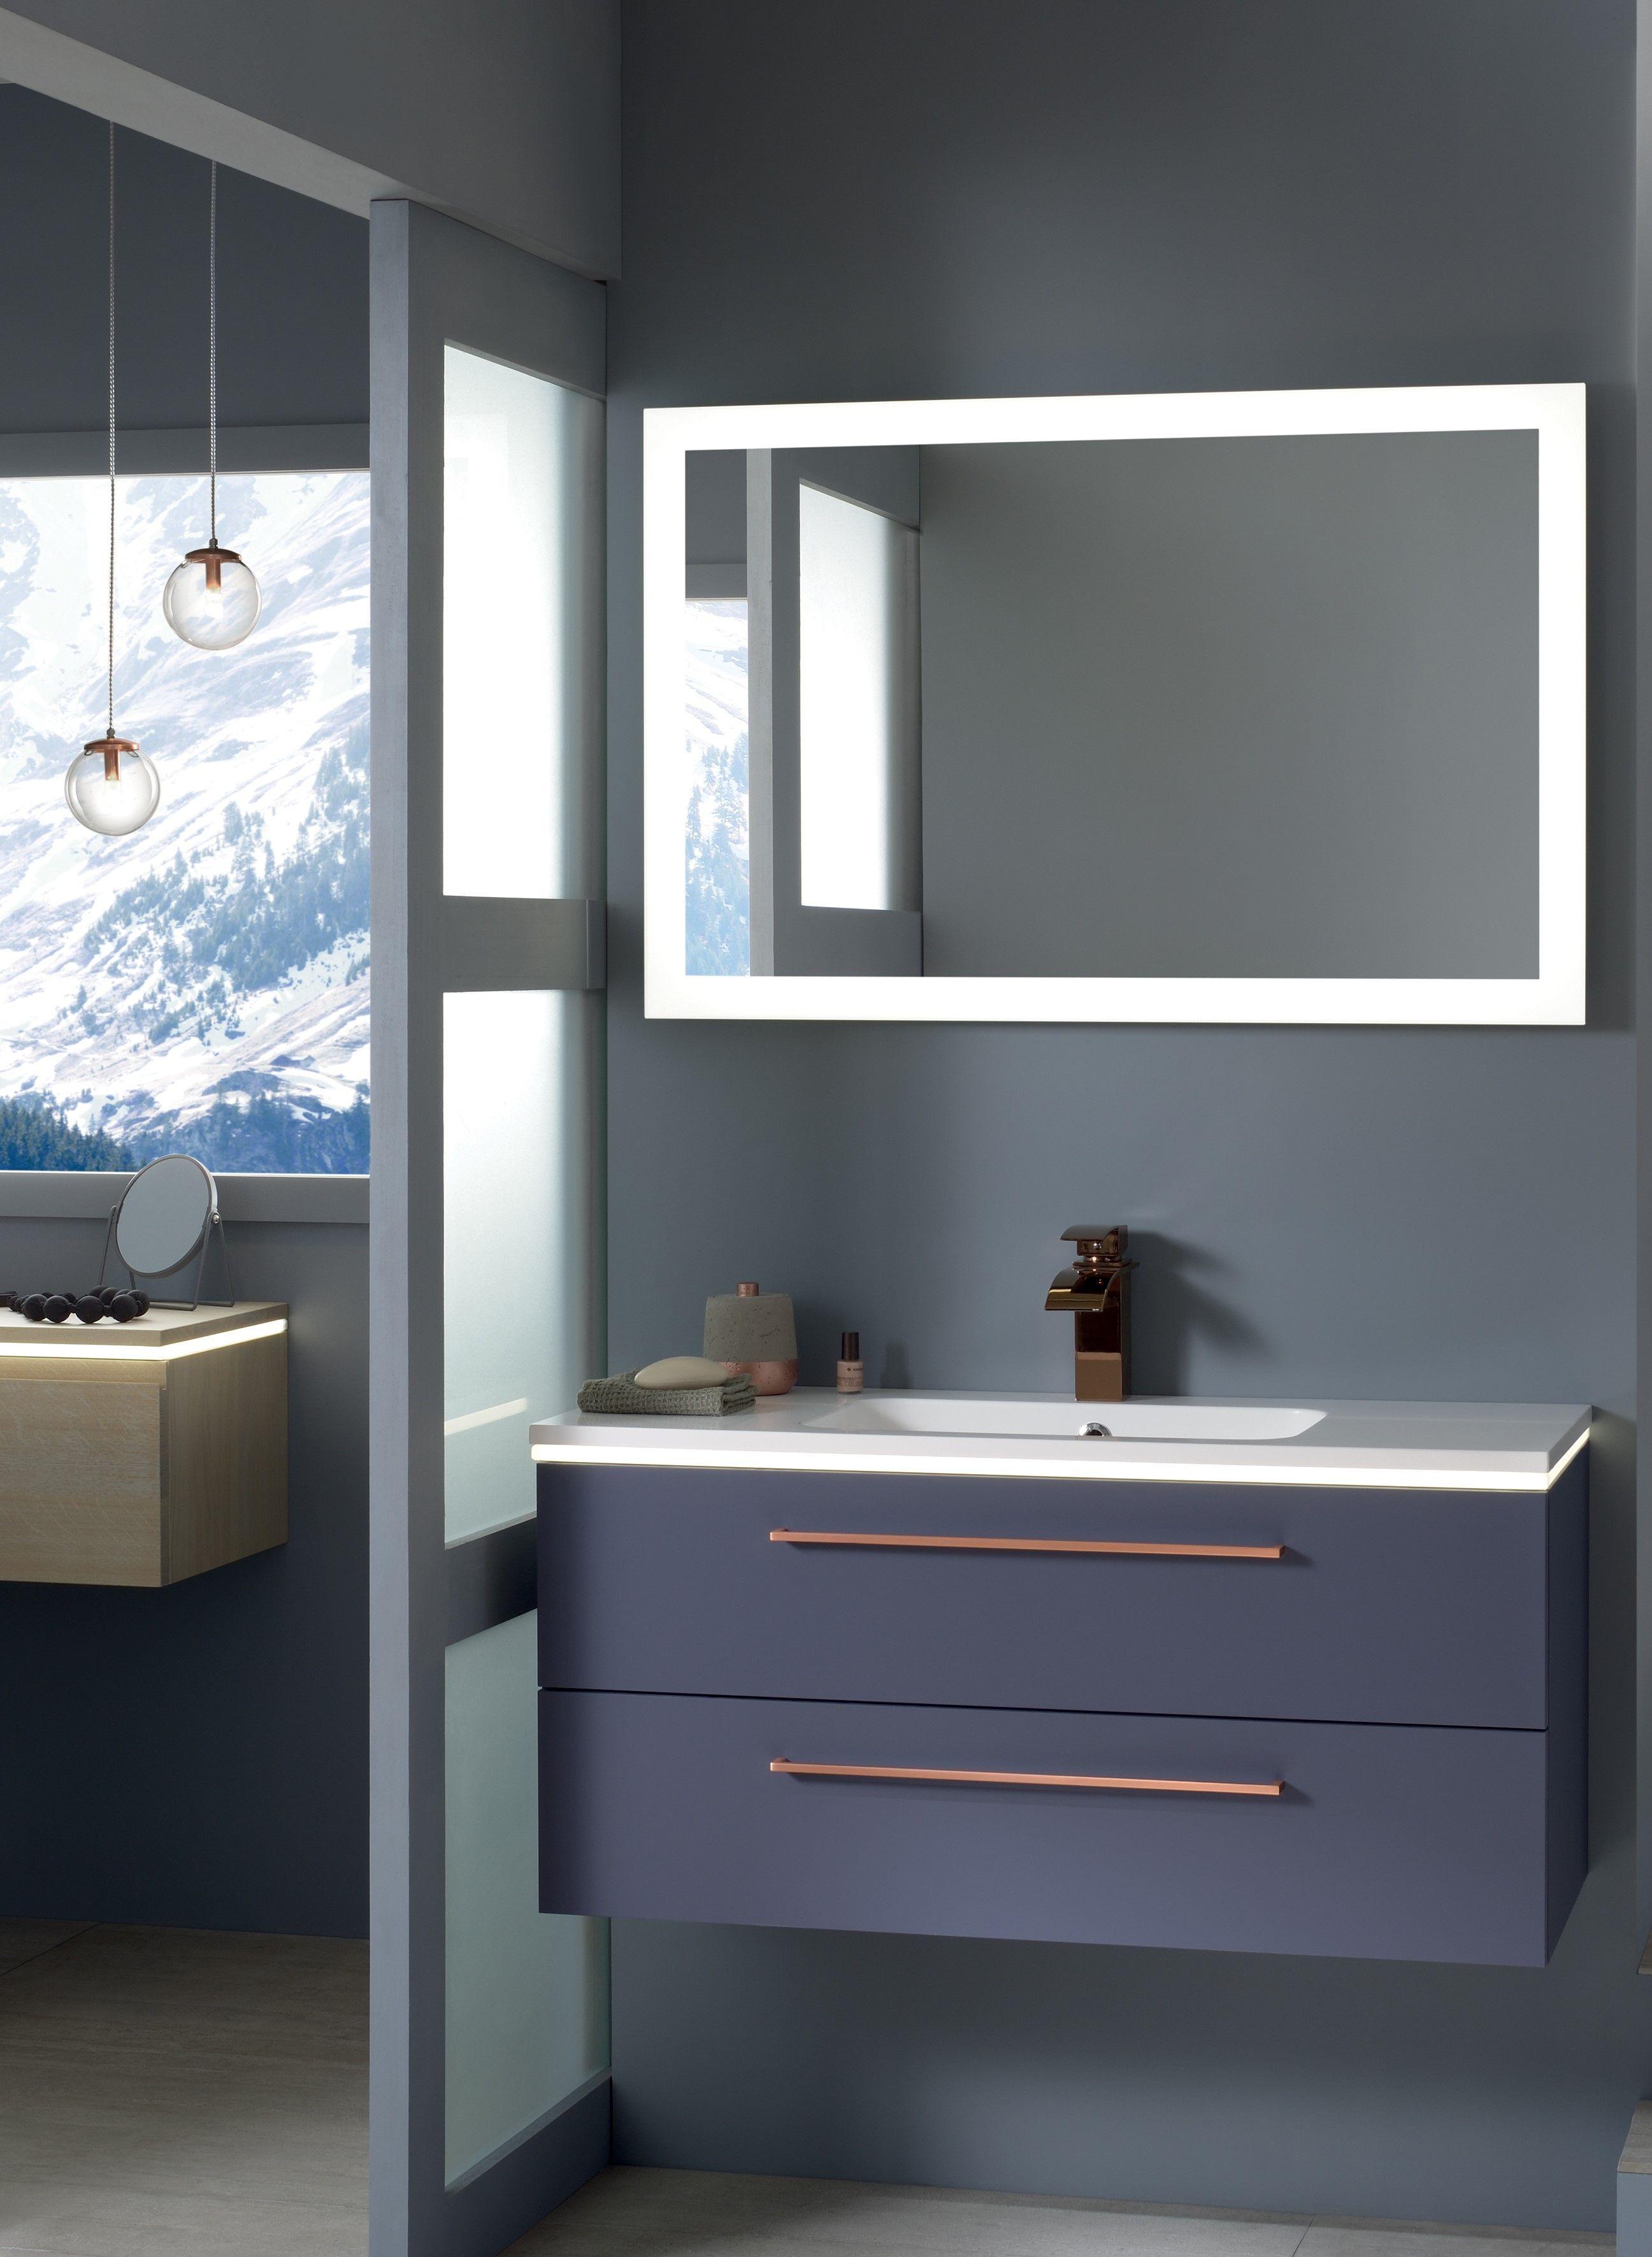 Petit Meuble Vasque Salle De Bain ce petit meuble vasque de la gamme luciole est aussi joli